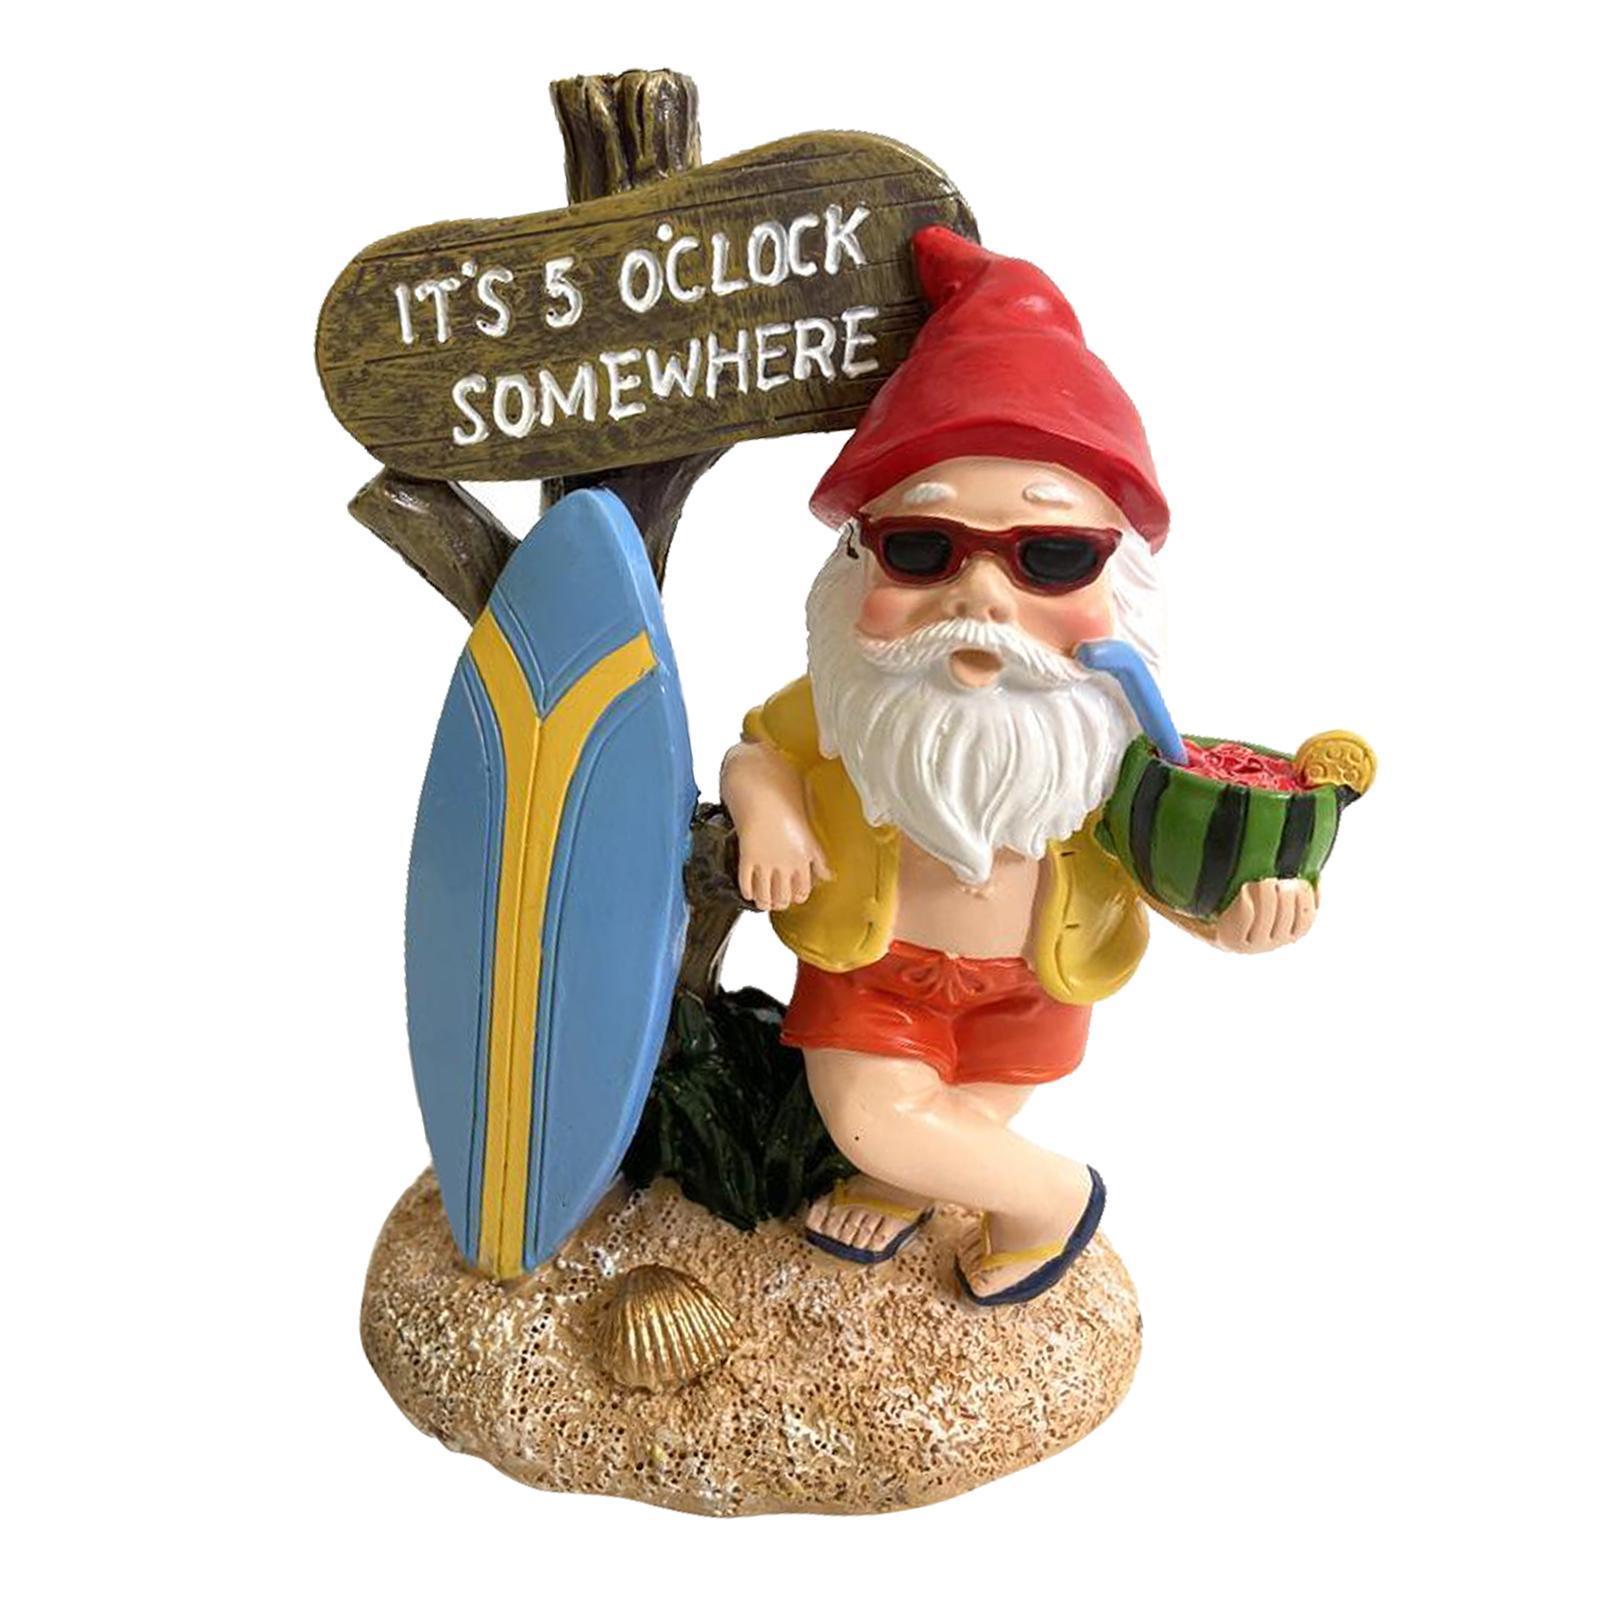 thumbnail 12 - Funny Resin Naughty Garden Gnome Statue Ornaments Villa Home Figurines Decor